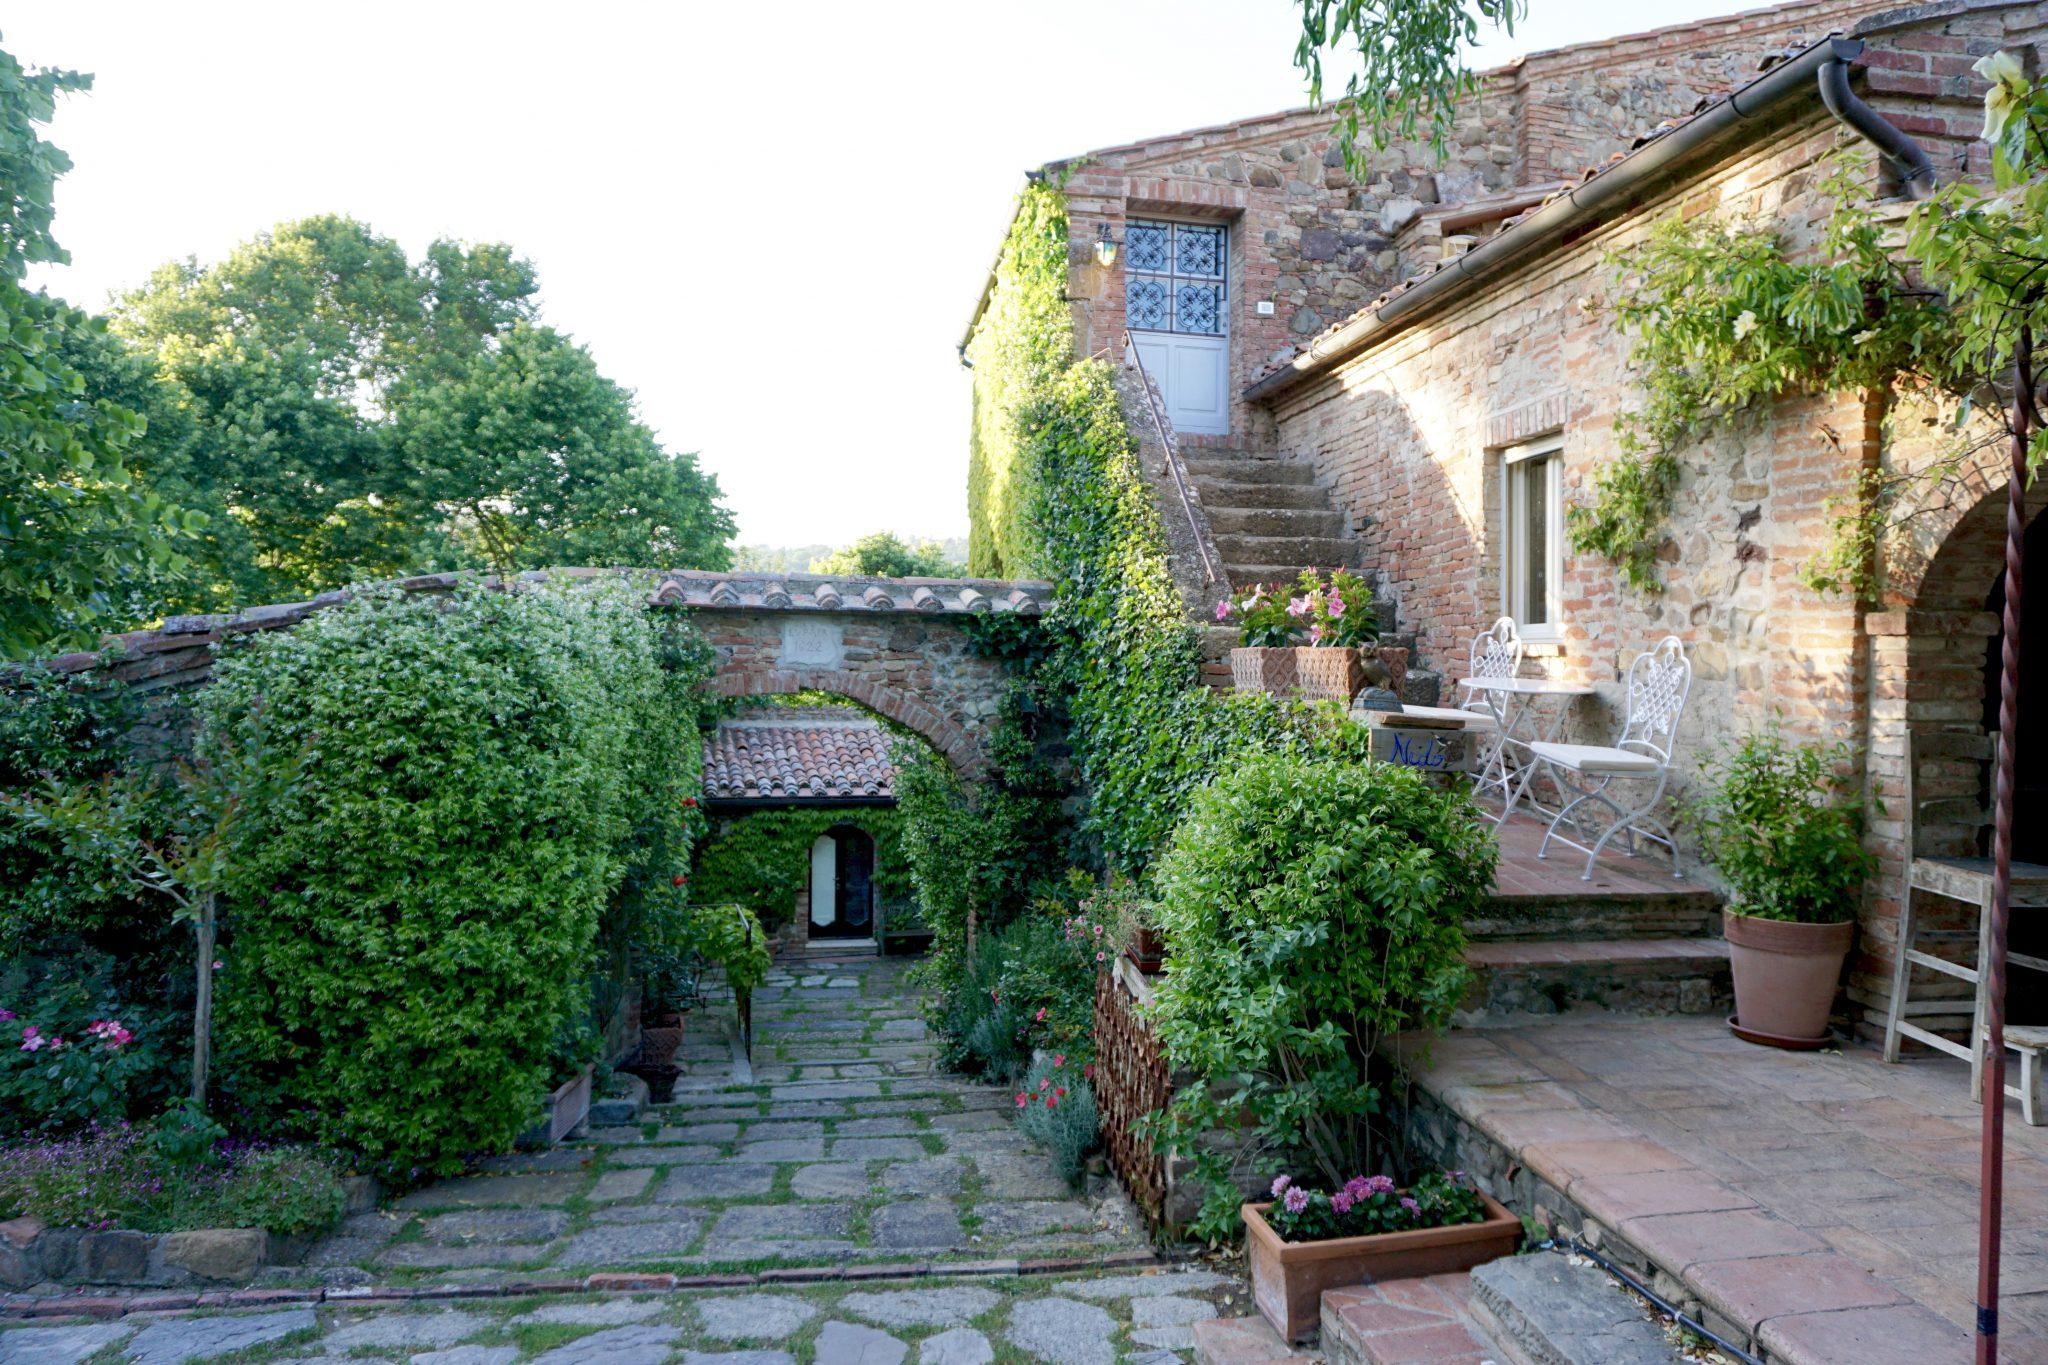 hotel lupaia, tuscan, farmhouse, tuscany, italy